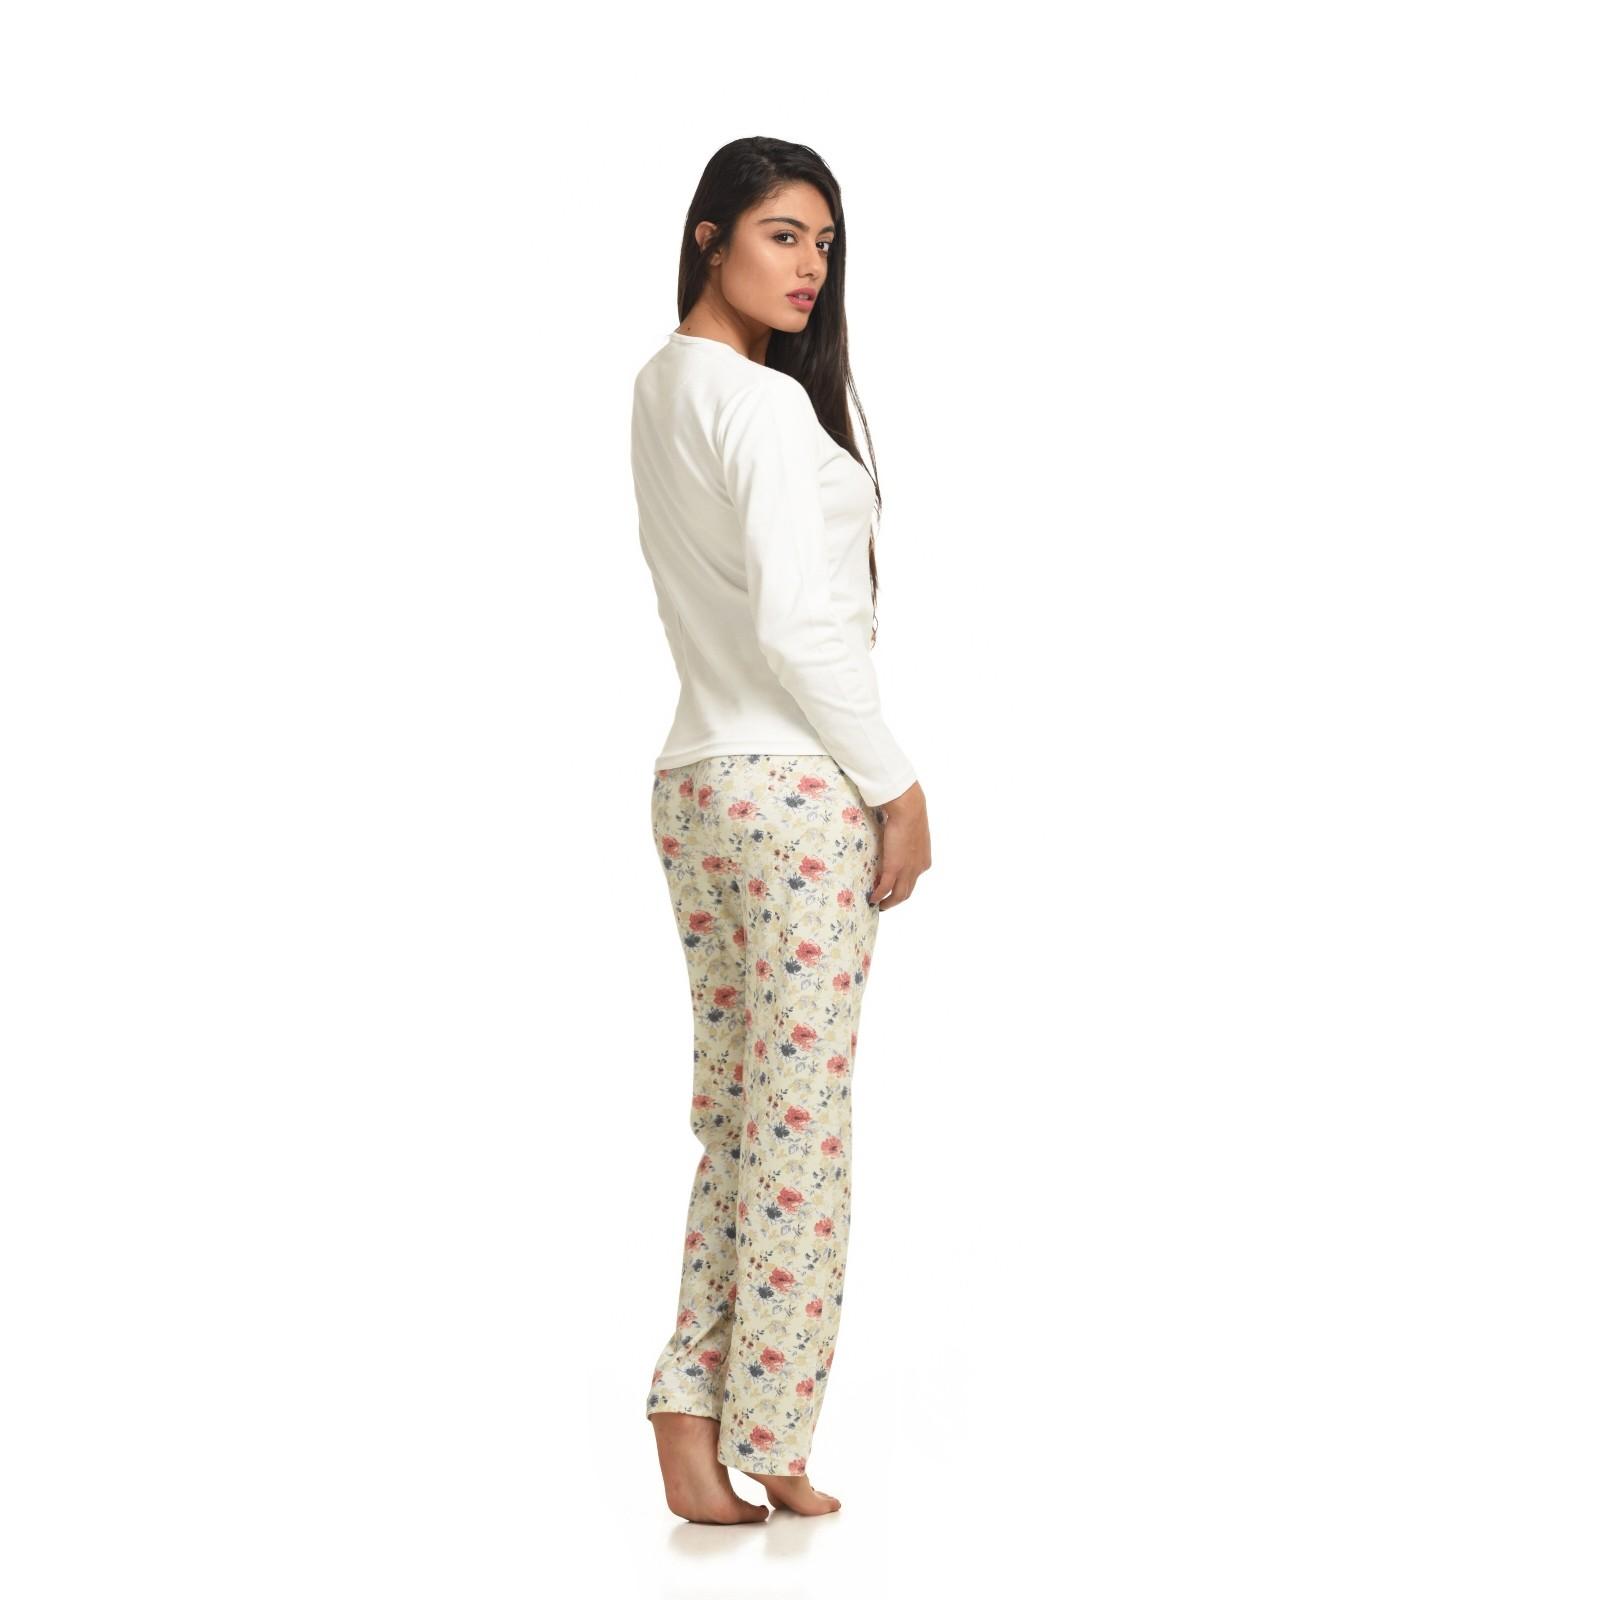 7c9d43e538a Mirano Γυναικεία Πυτζάμα με εμπριμέ παντελόνι -MIR3510